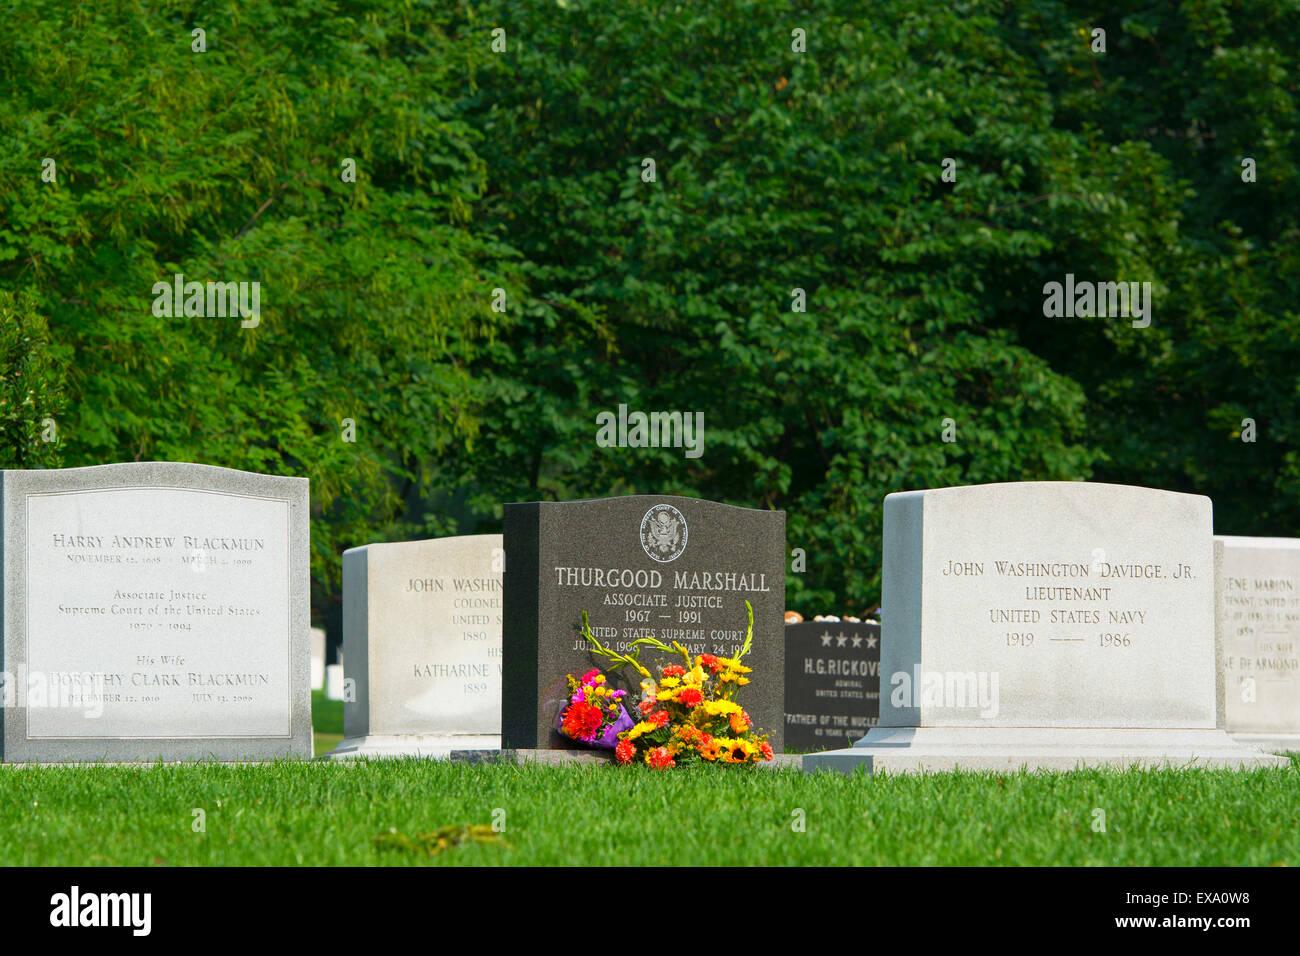 Arlington Cemetery, Grave Stones, Thurgood Marshall, Washington DC - Stock Image